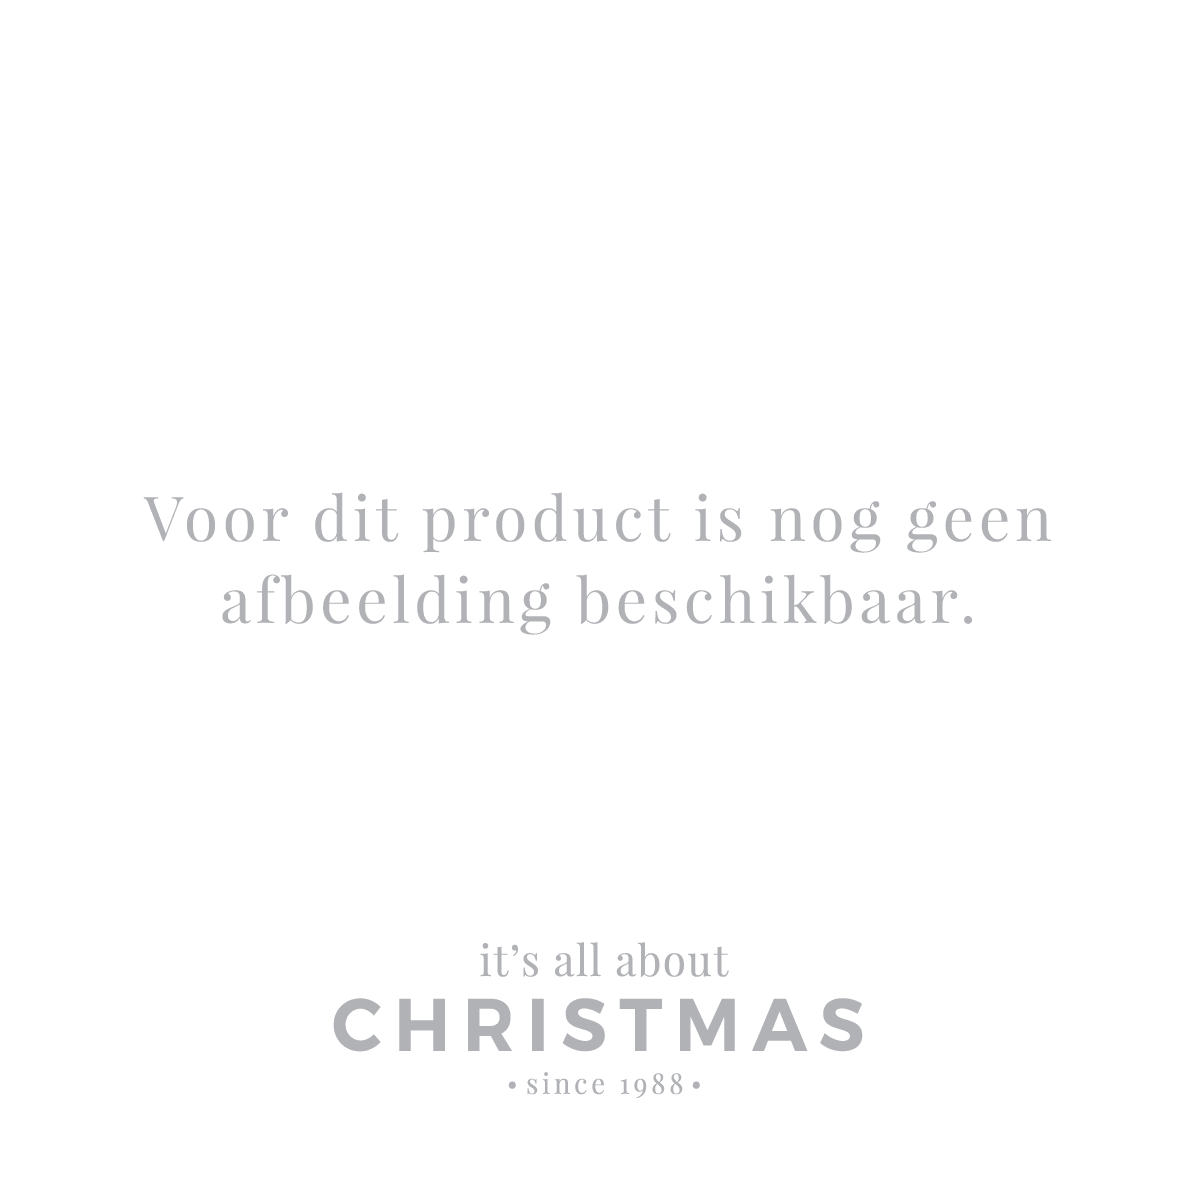 Christbaumkugeln Glas Kupfer.44 Christbaumkugeln Glas Kupfer Mix It S All About Christmas